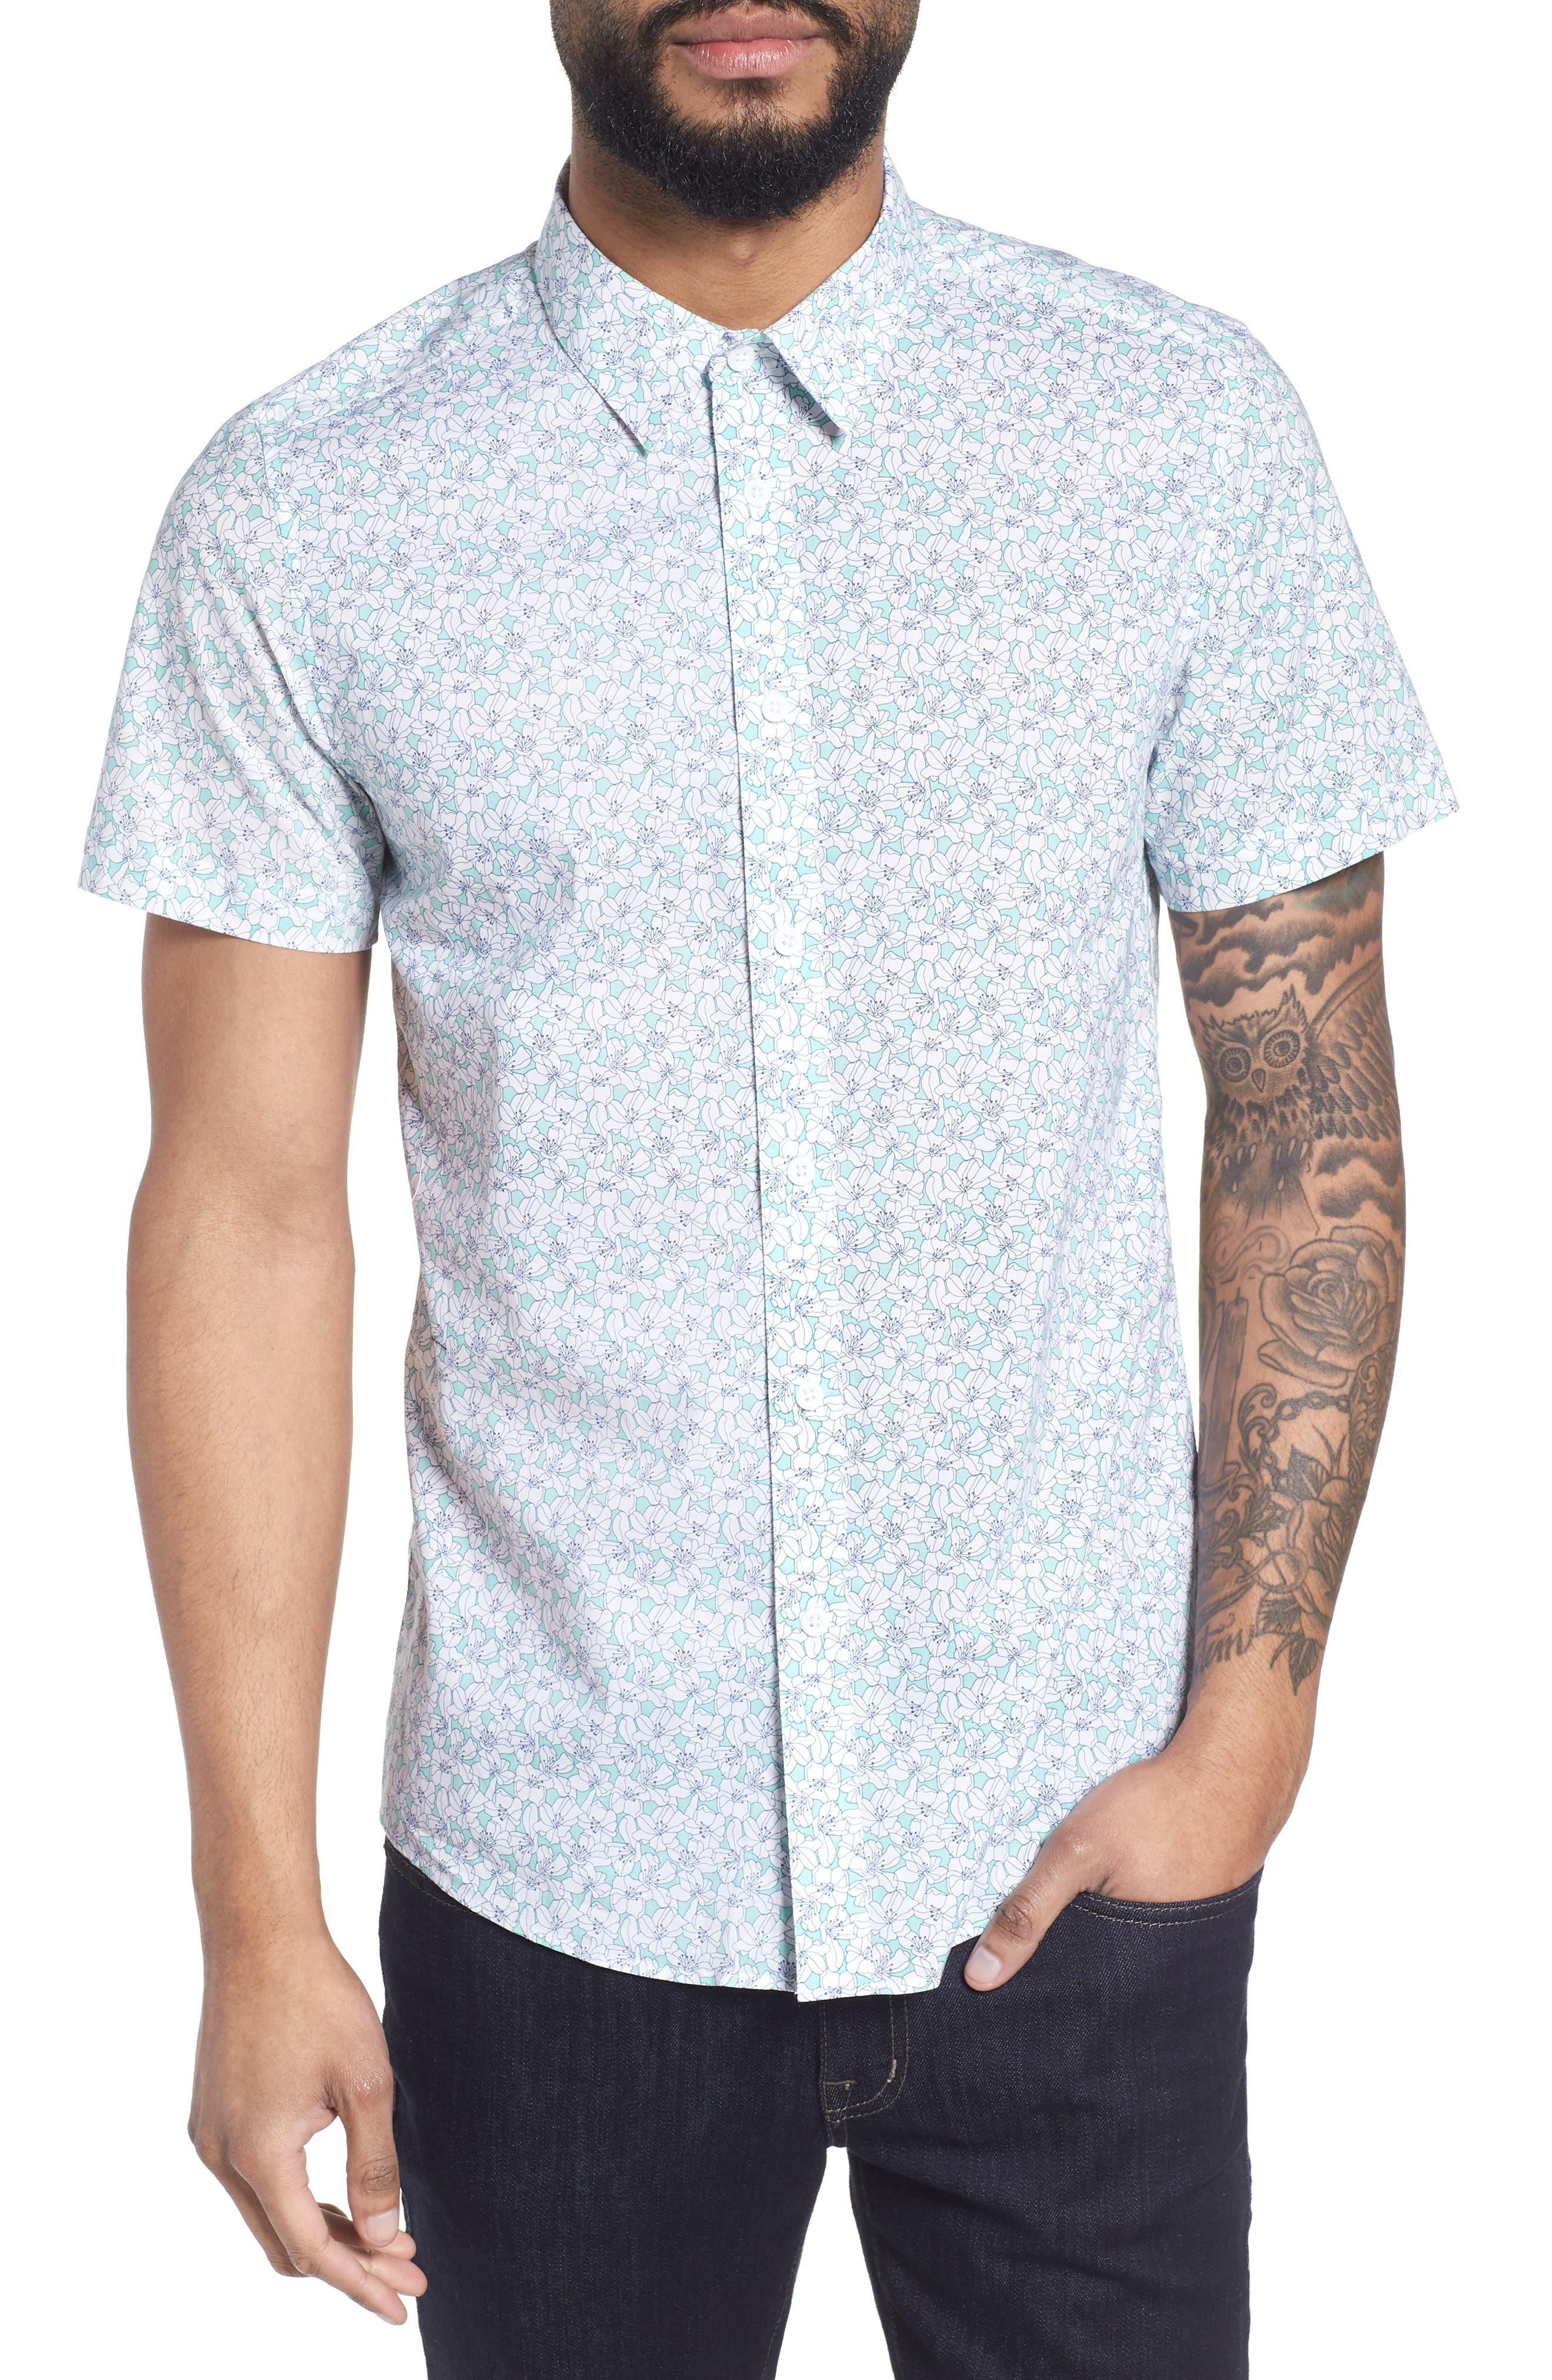 Alternate Image 1 Selected - TWENTYMETRICTONS Slim Flit Floral Woven Shirt